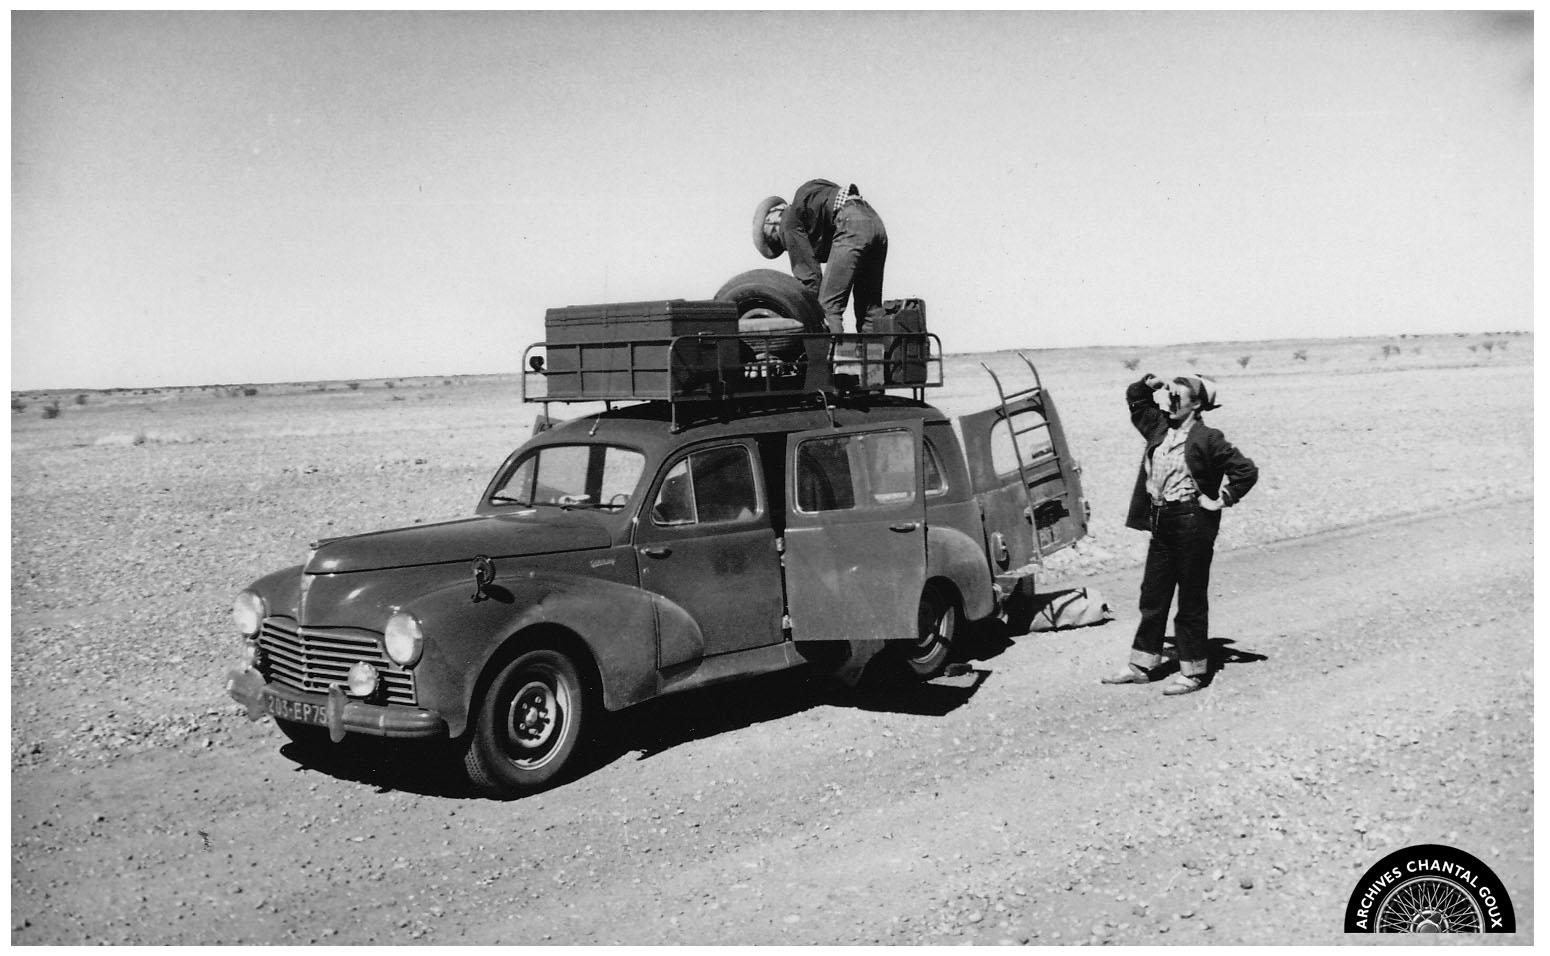 1956_M-C_raid_afrique_9w